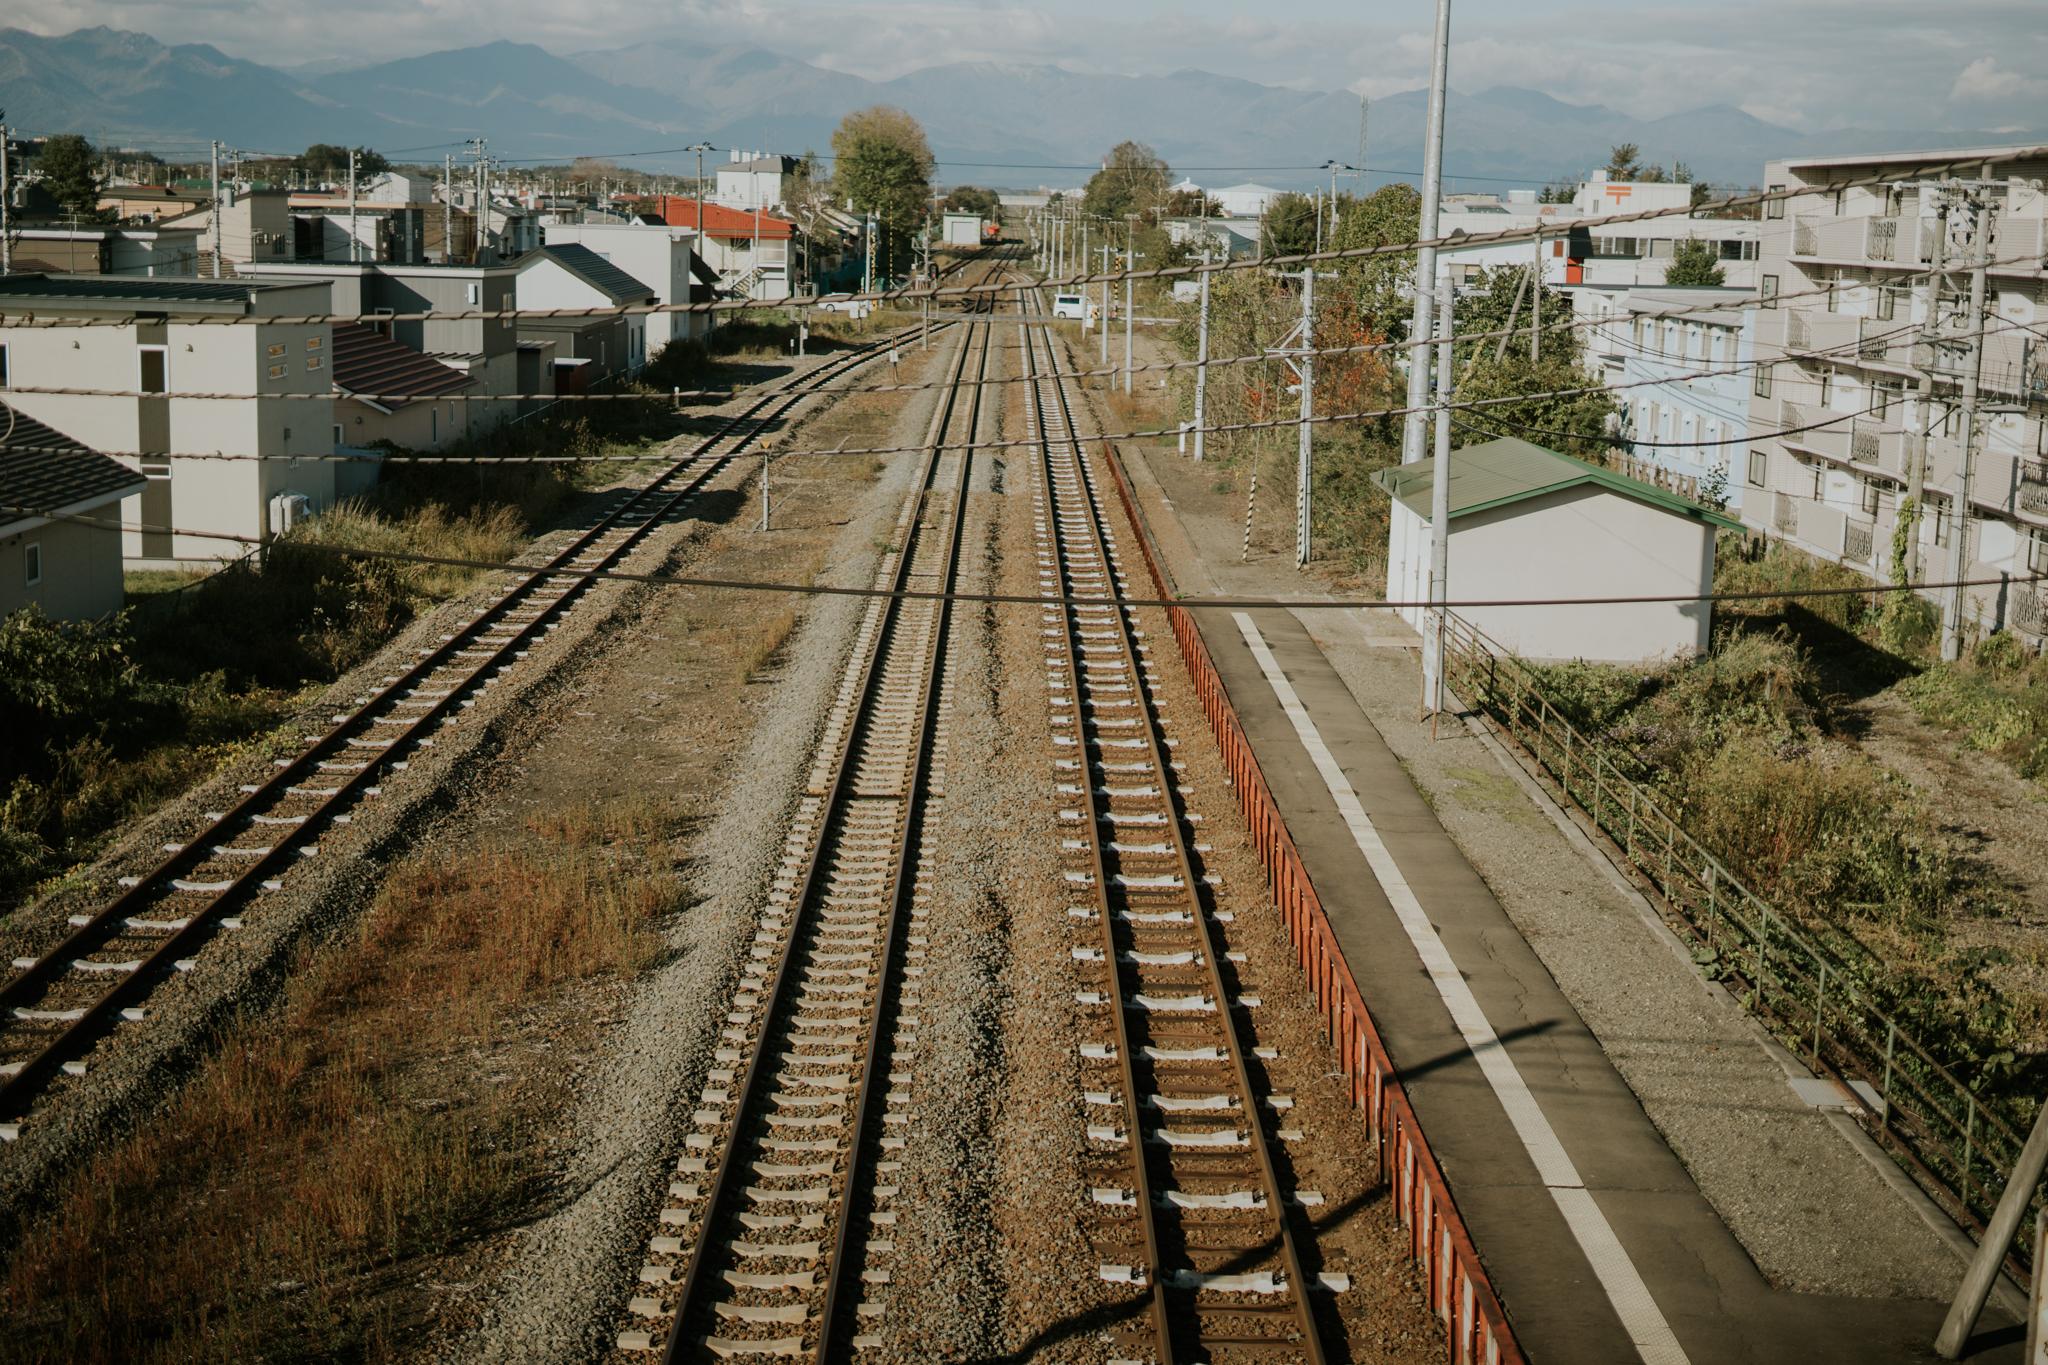 Medric-449.jpg